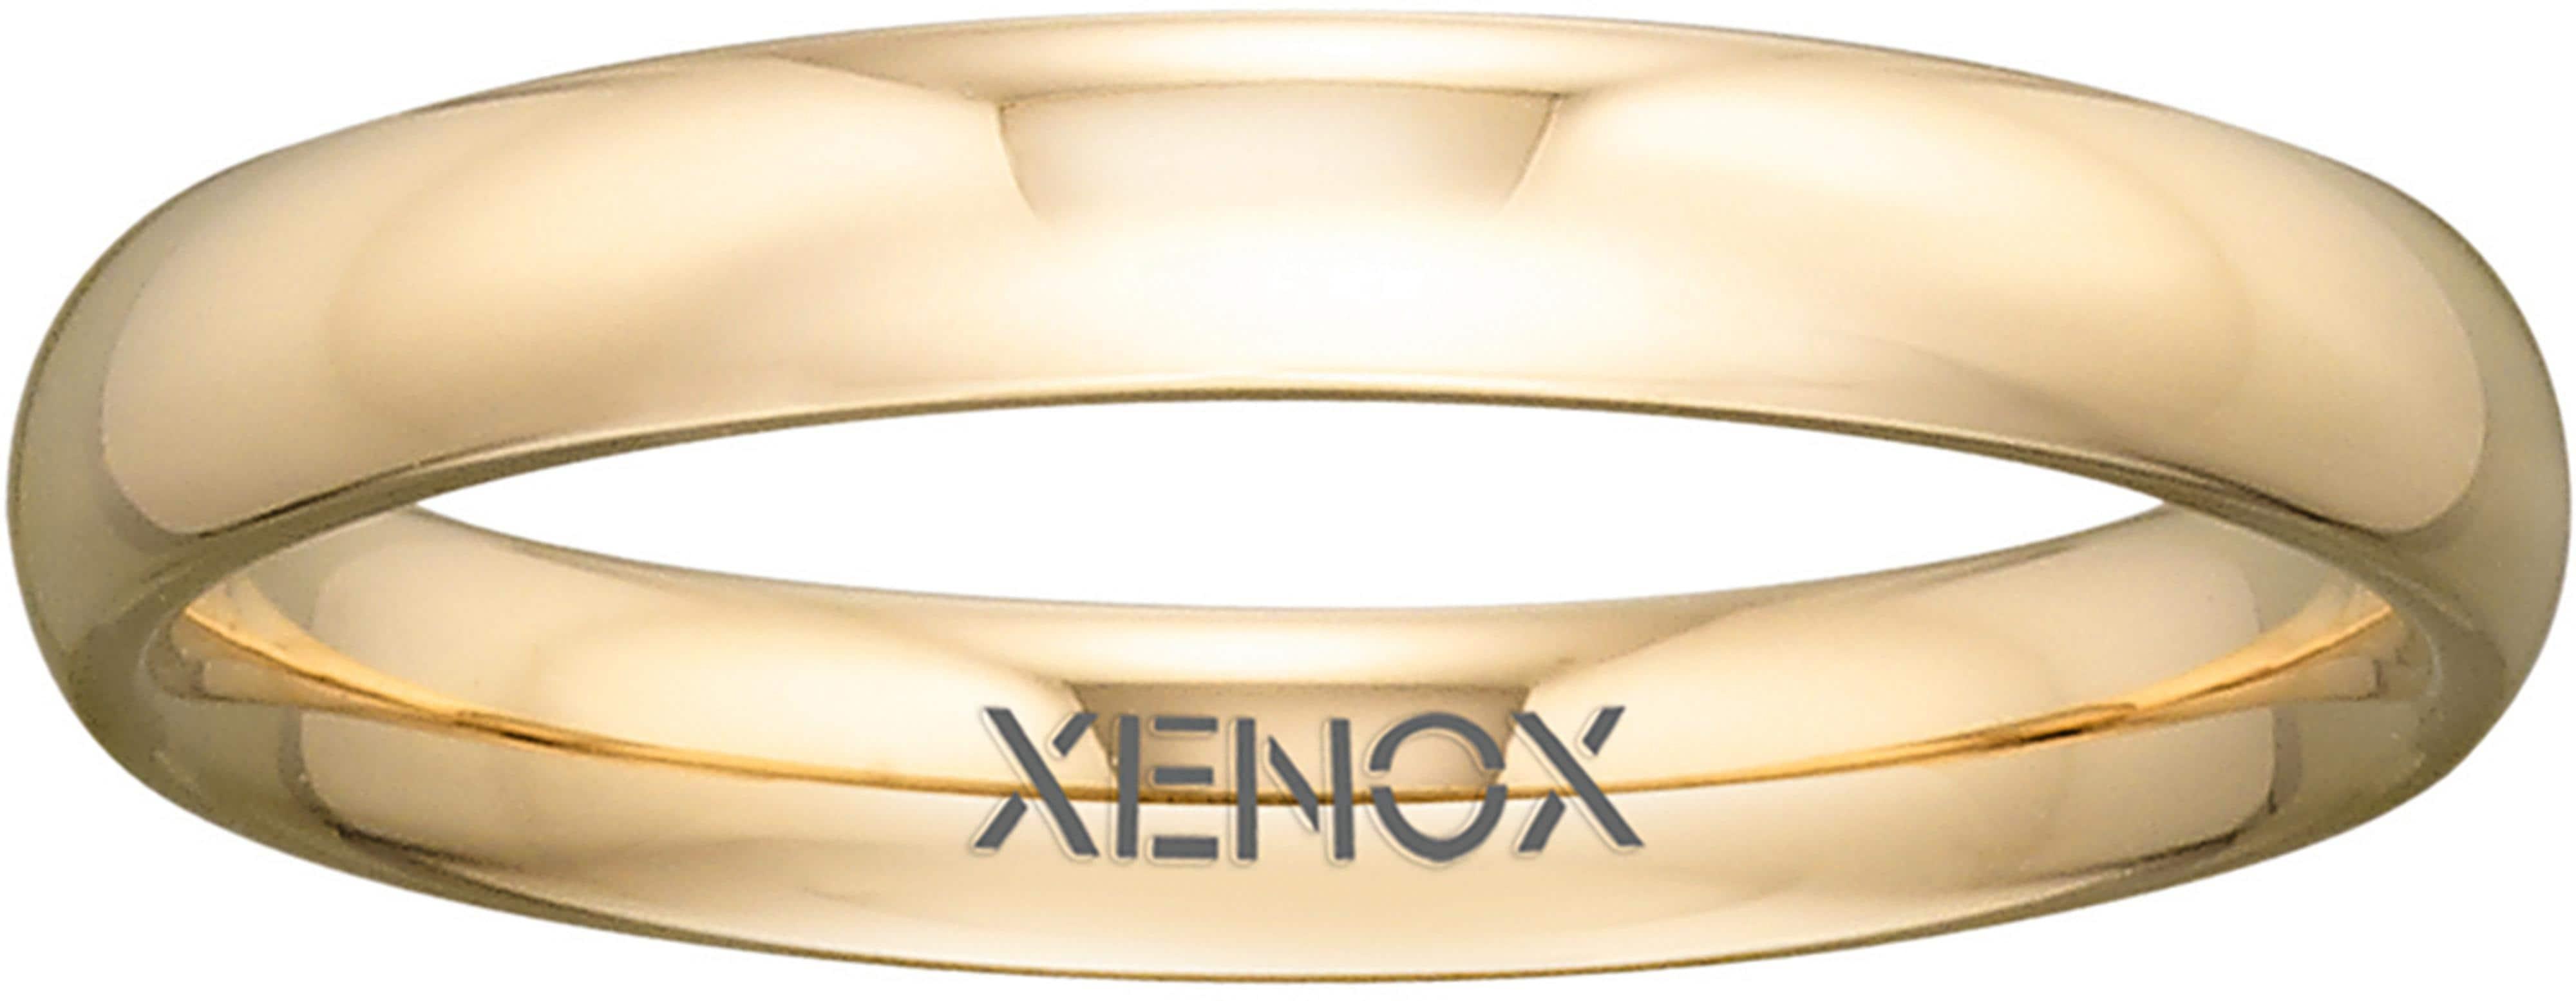 XENOX Partnerring »Xenox & Friends, X2306« | Schmuck > Ringe > Partnerringe | XENOX